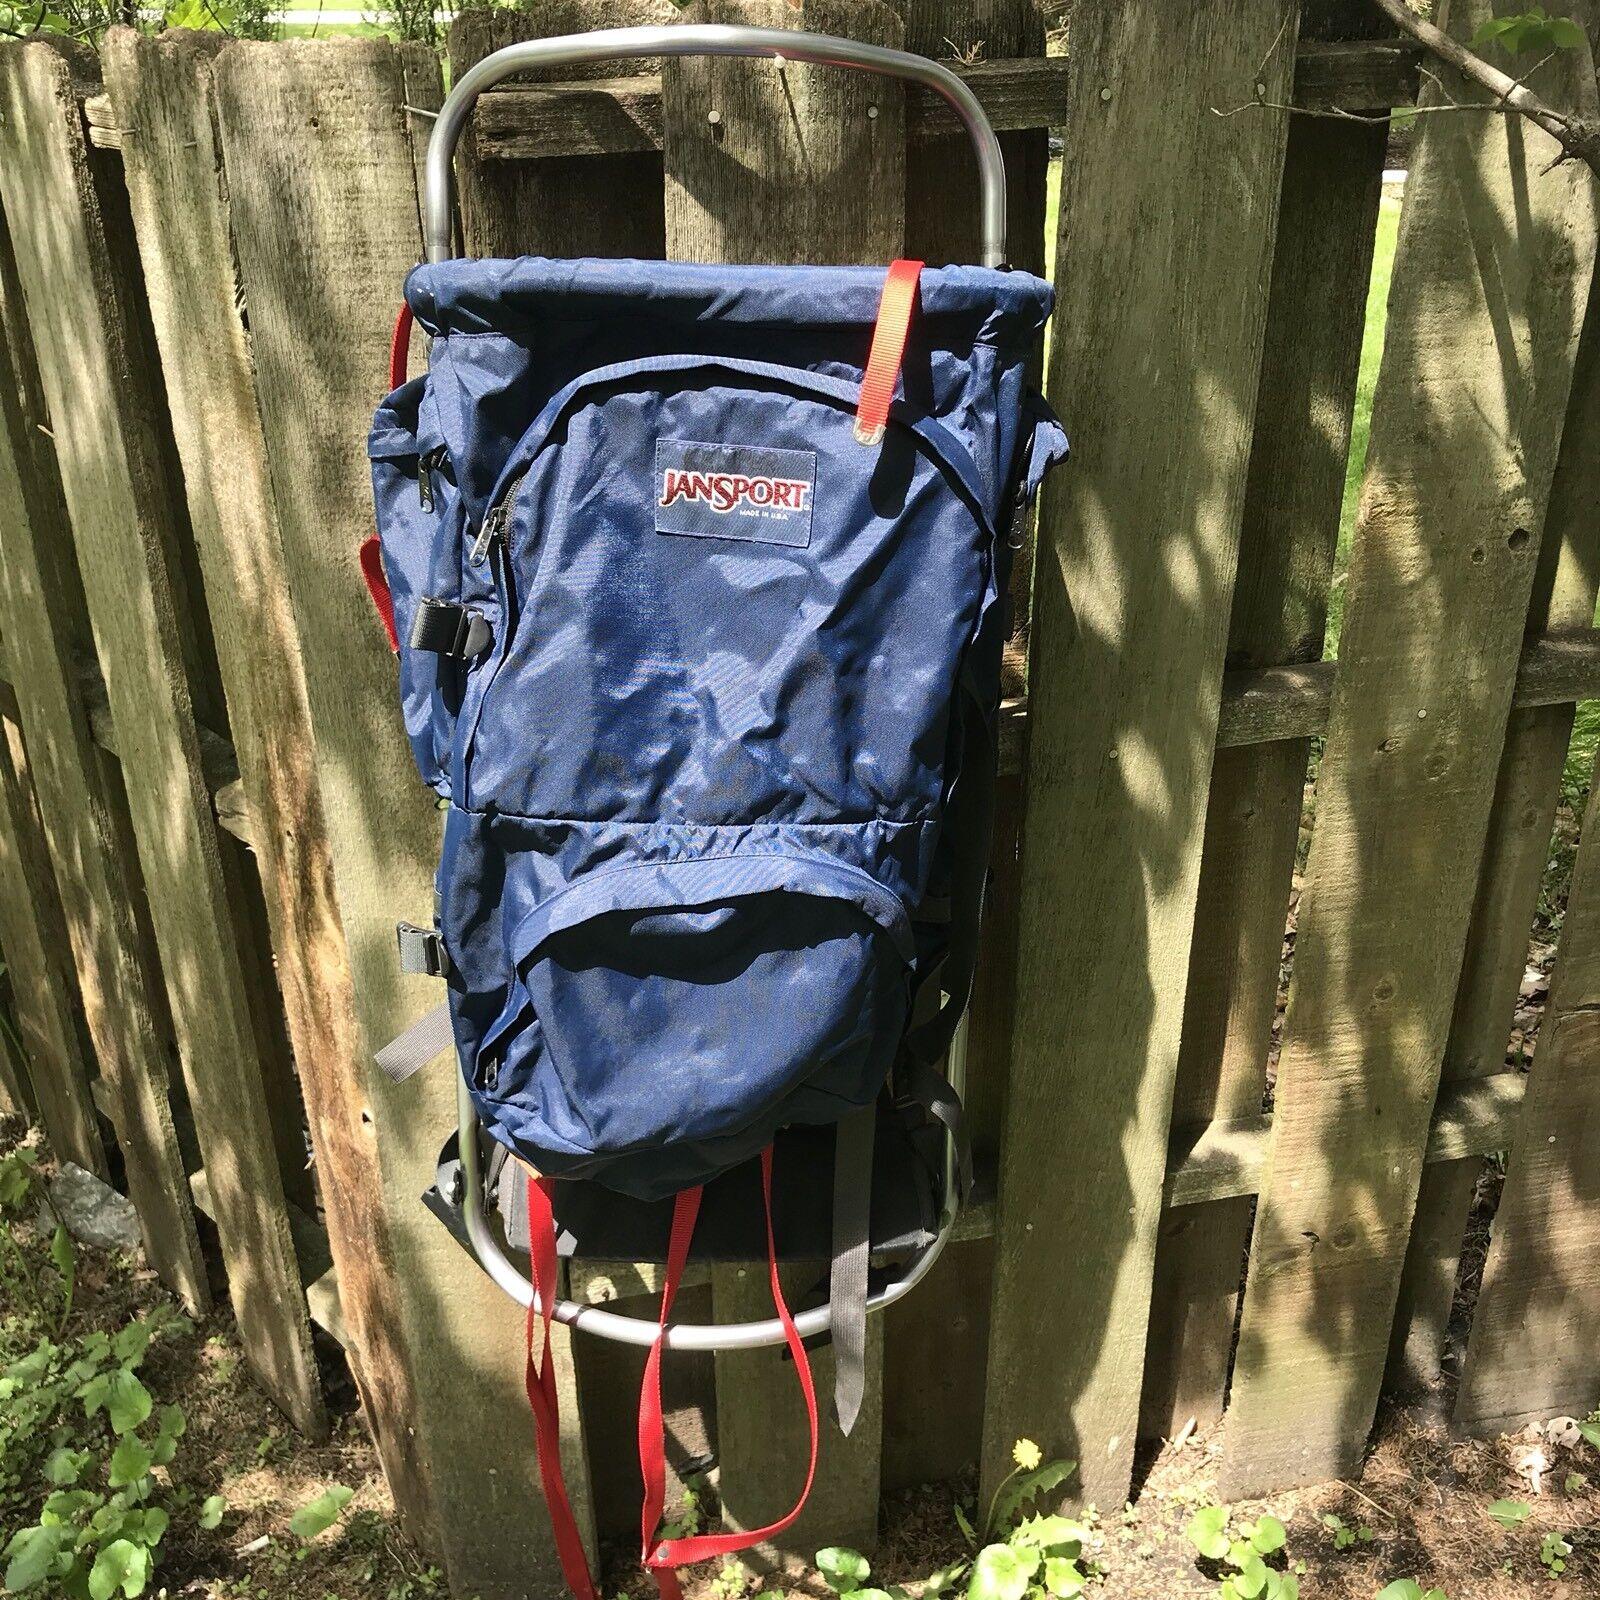 Vtg Jansport Blau   rot External Frame Backpack Hiking Camping Made in USA